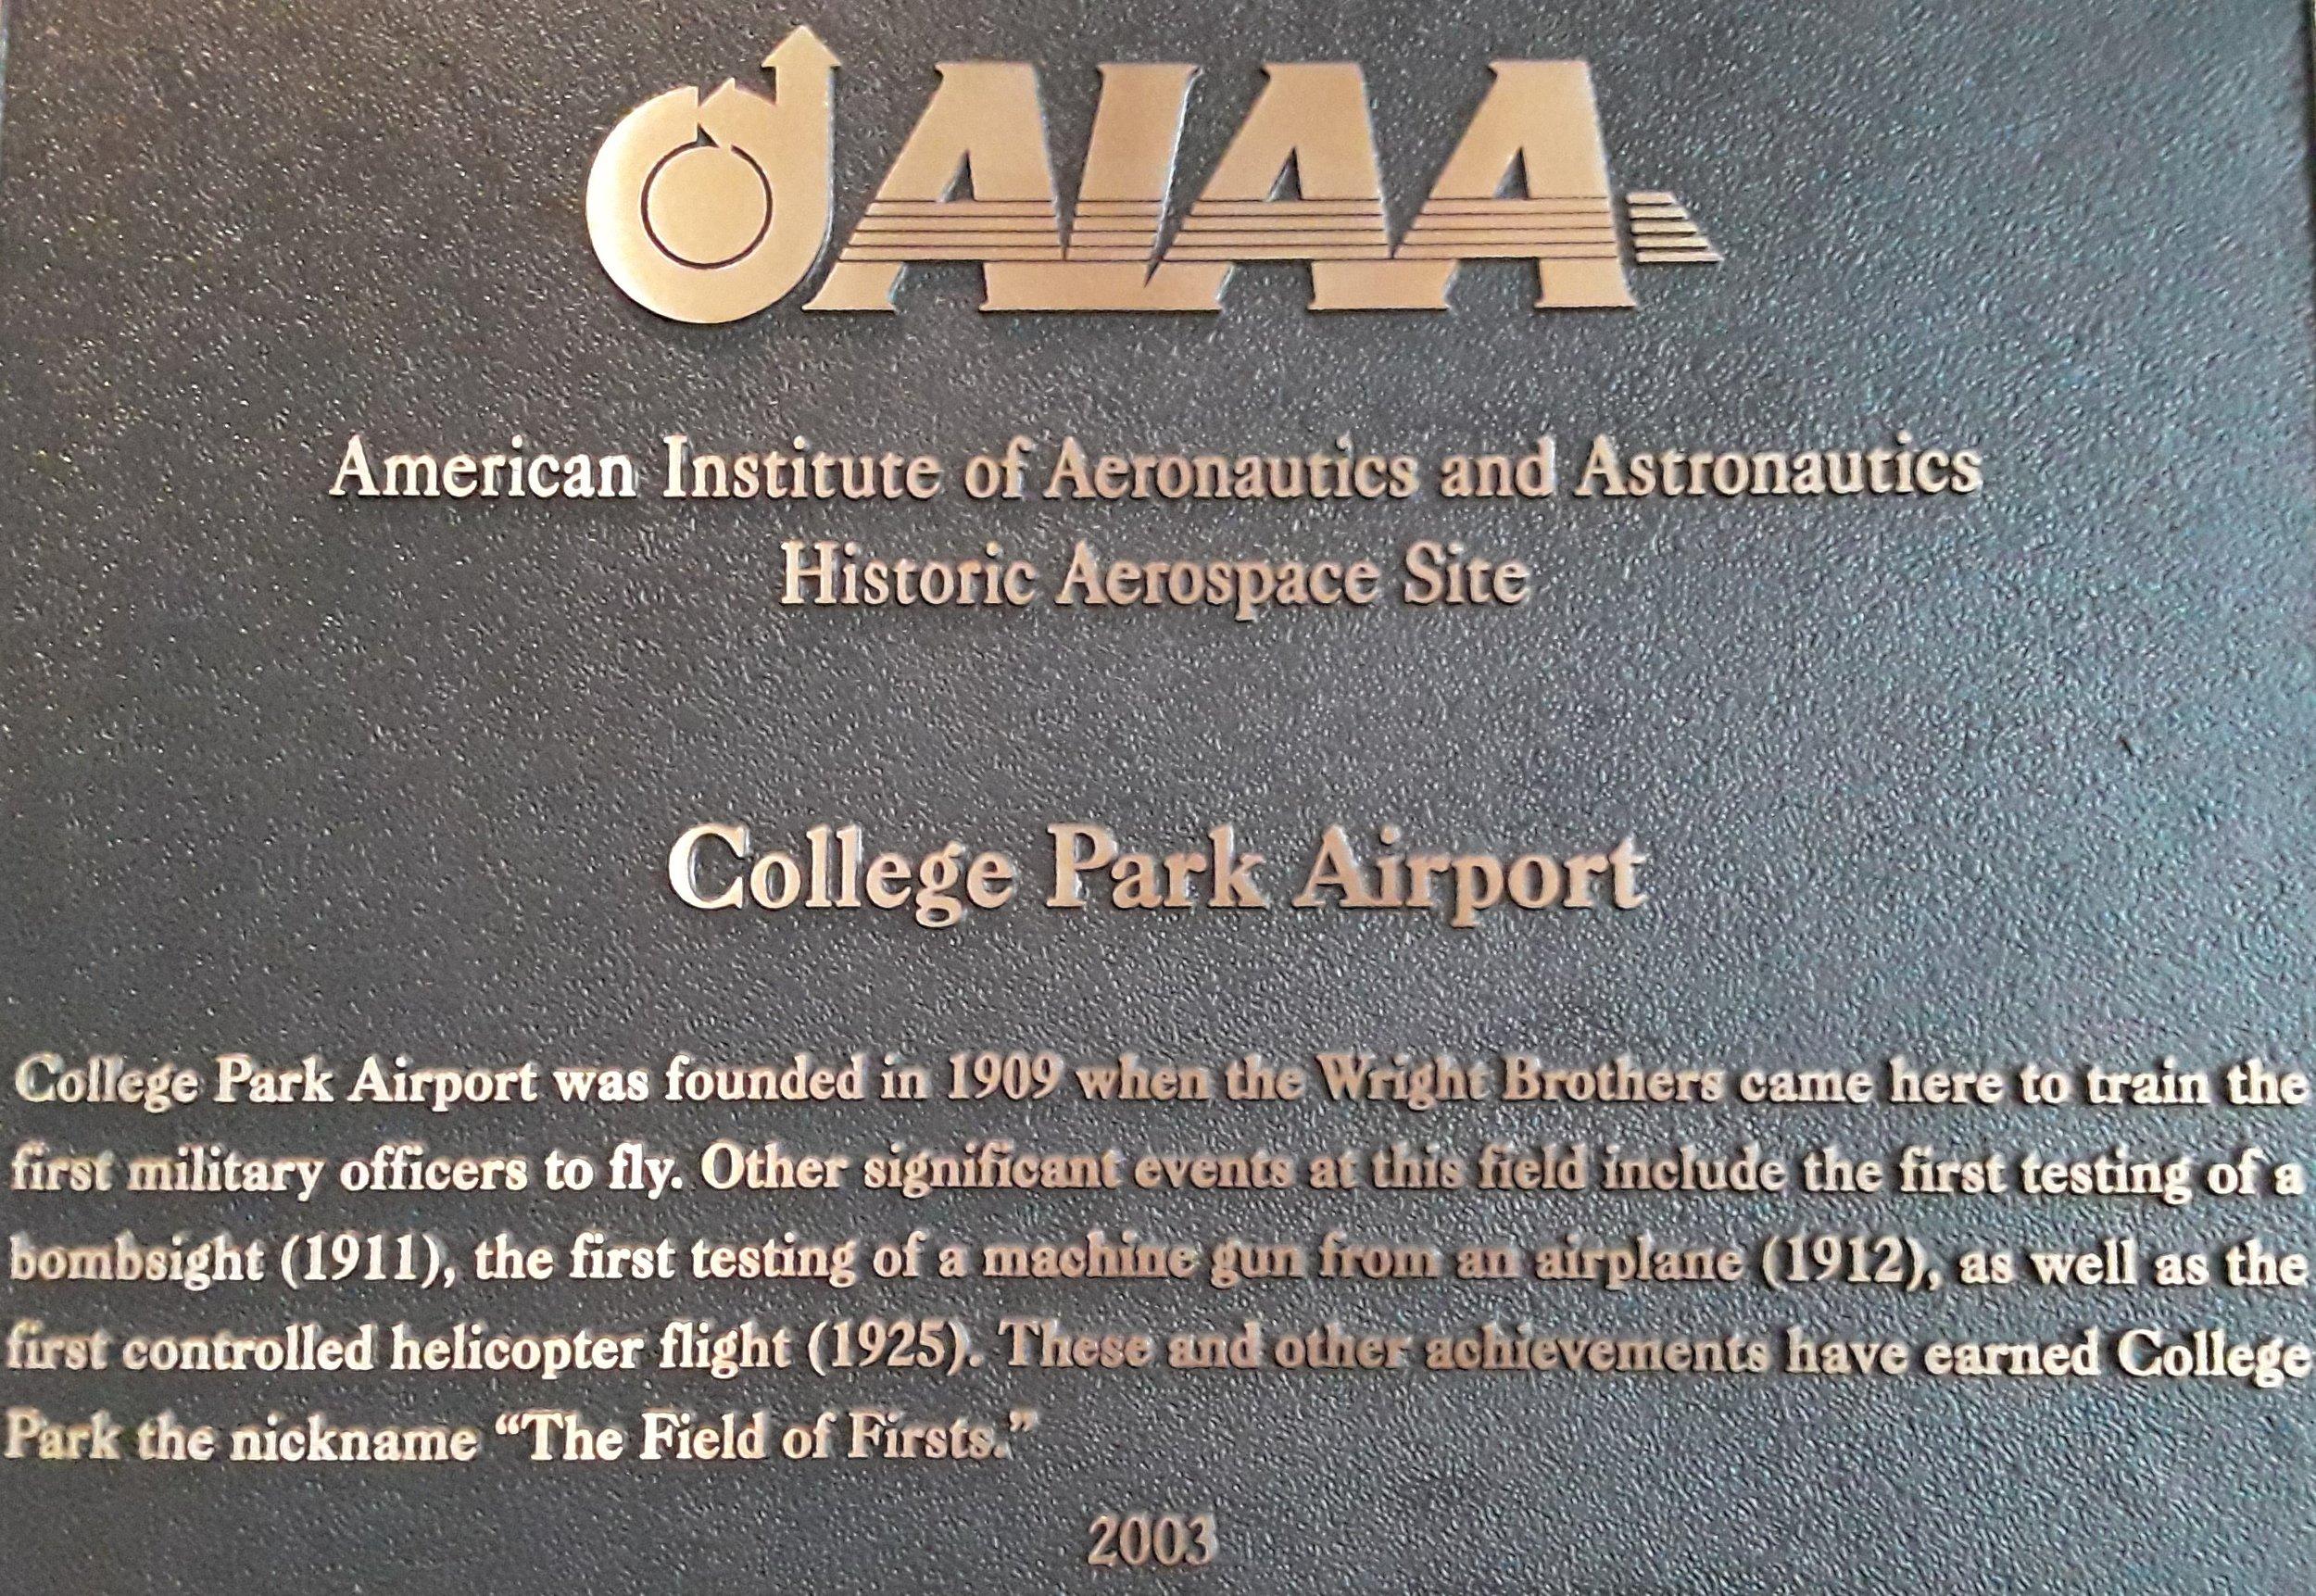 College Park Airport20181201_131747.jpg